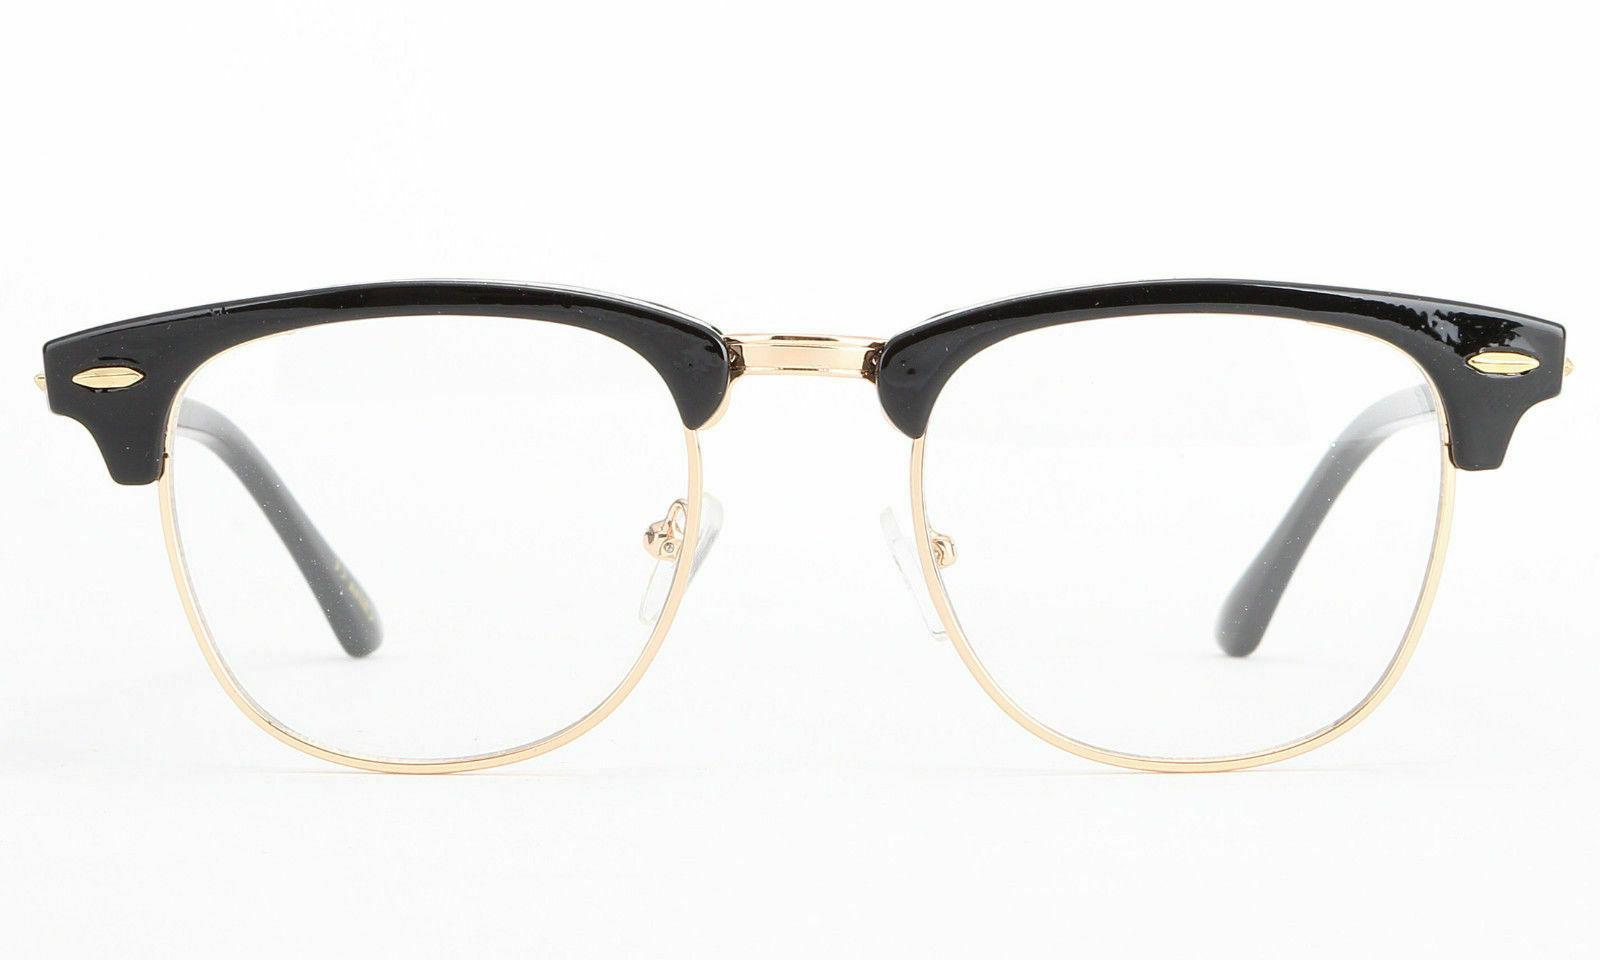 Interview Glasses Fake 100%